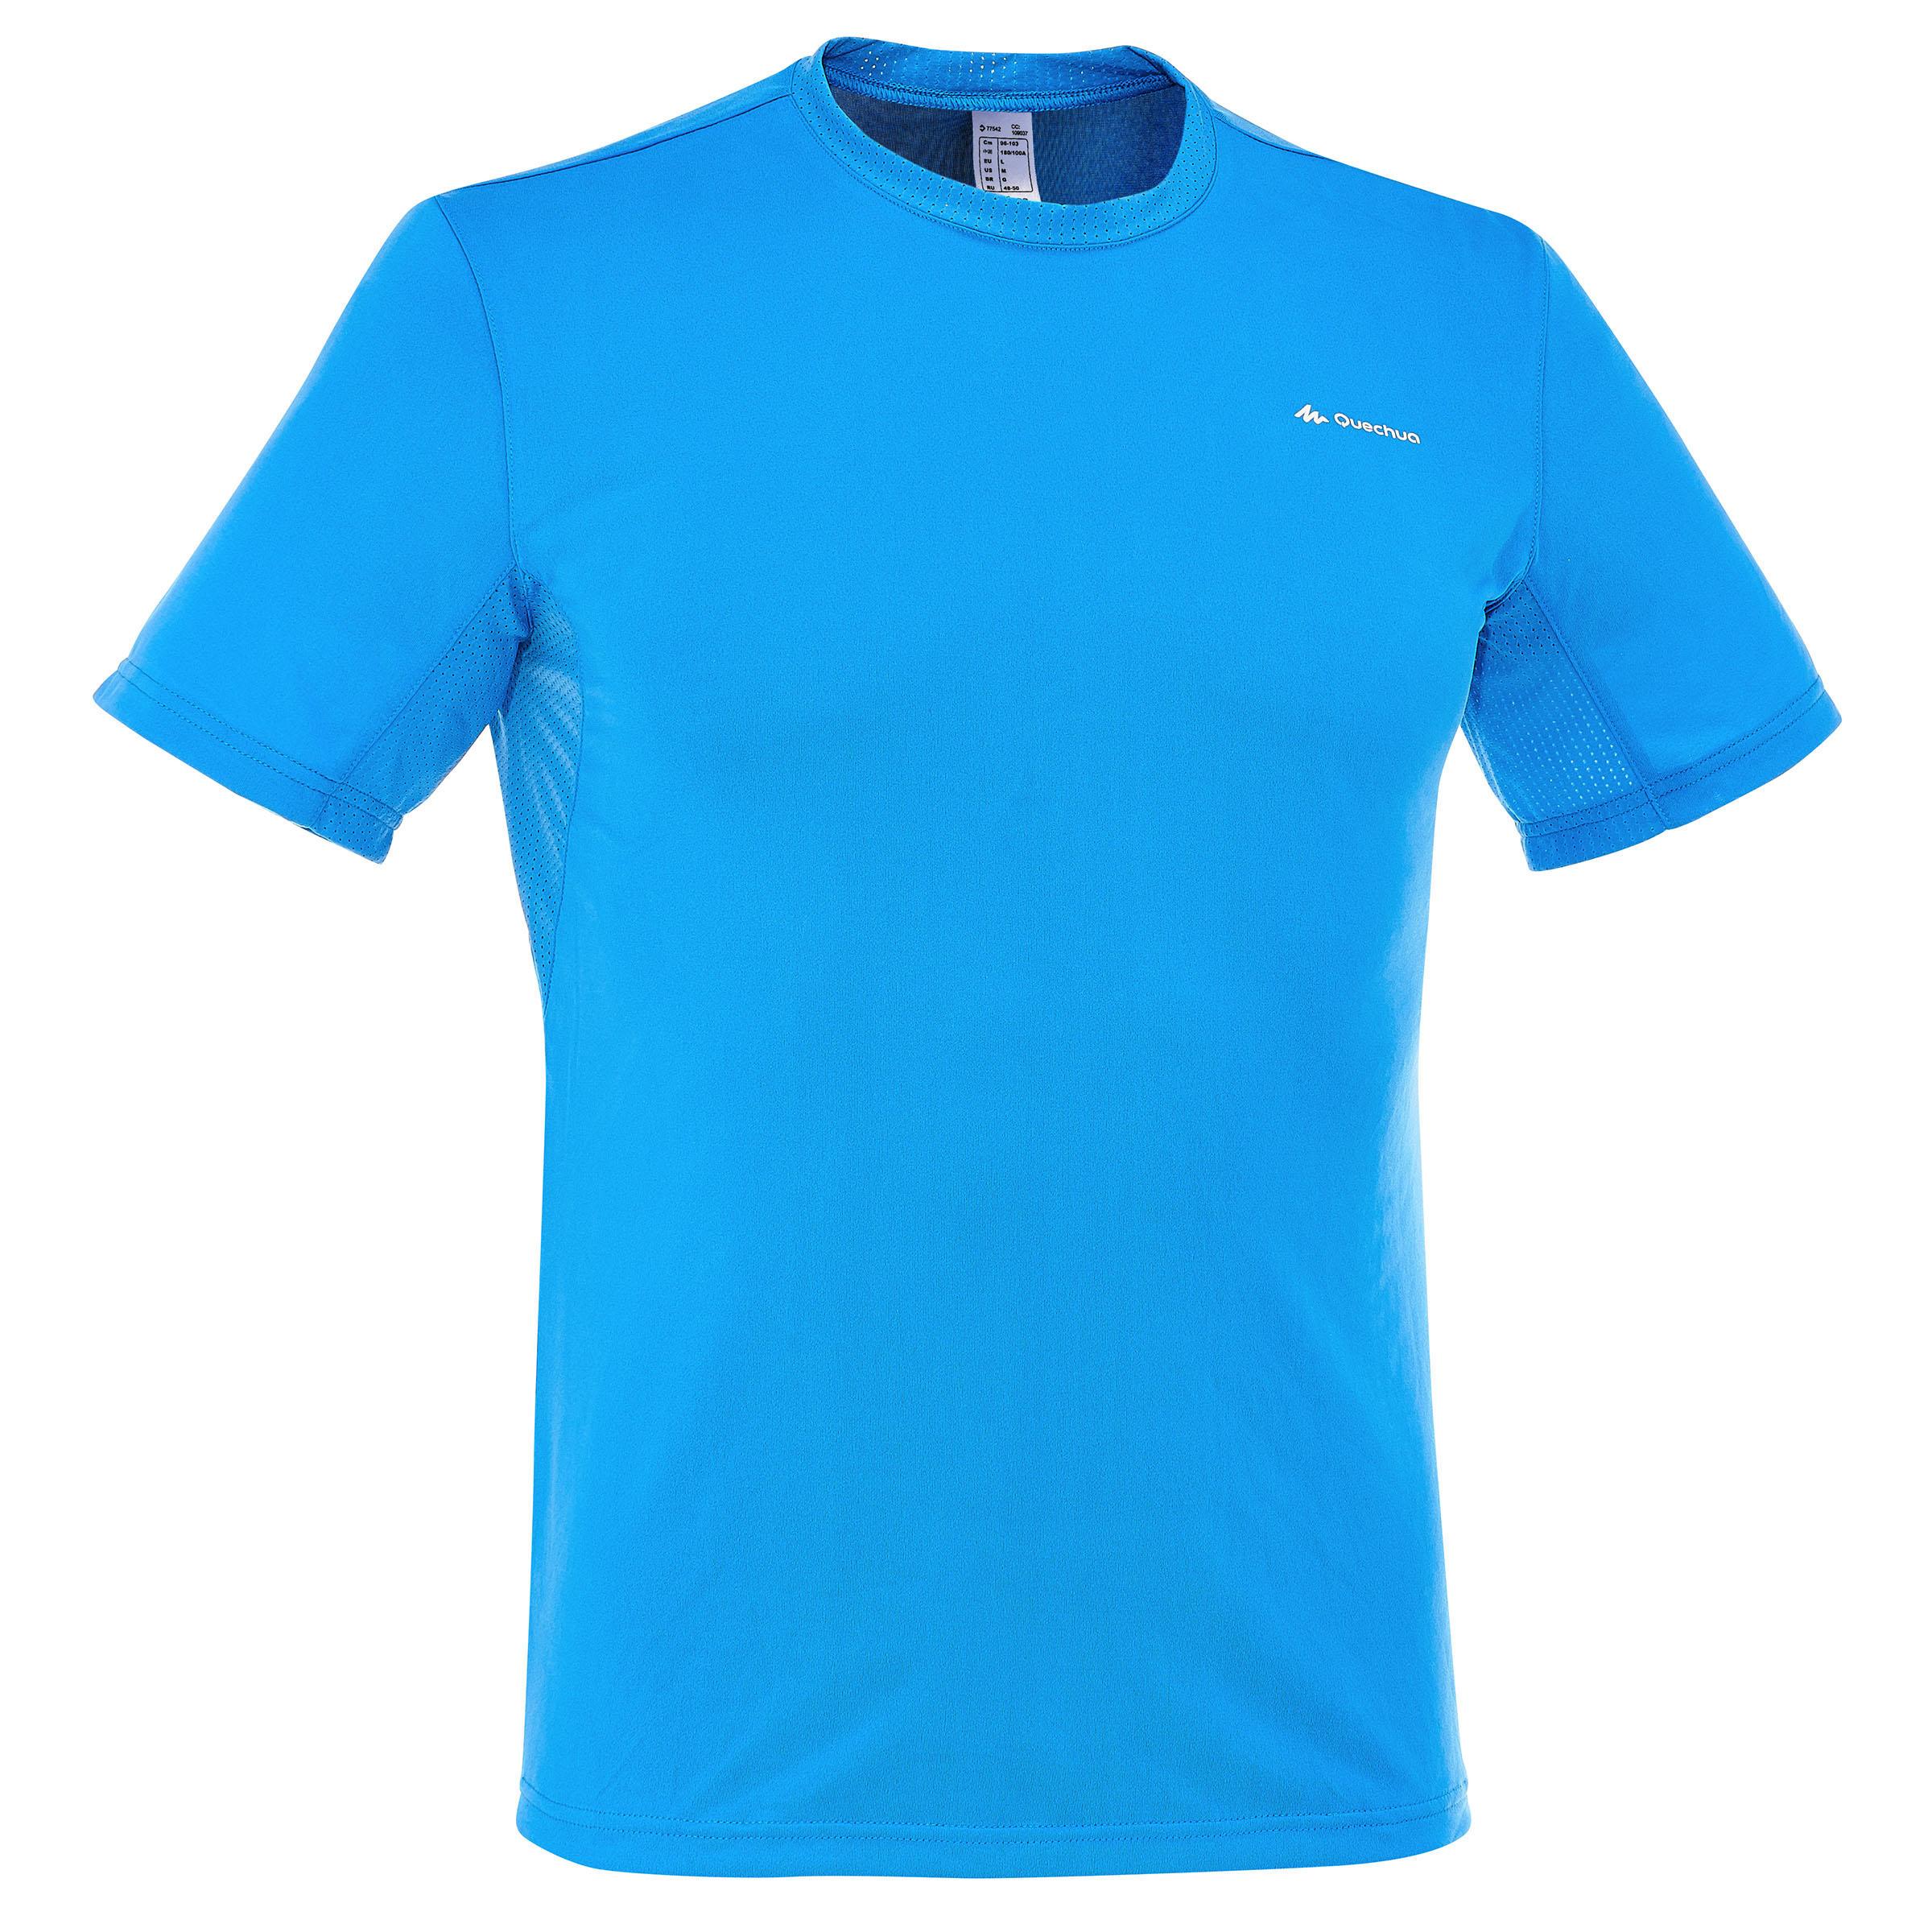 Camiseta de manga corta campamentoTechFRESH 50 caballero azul claro